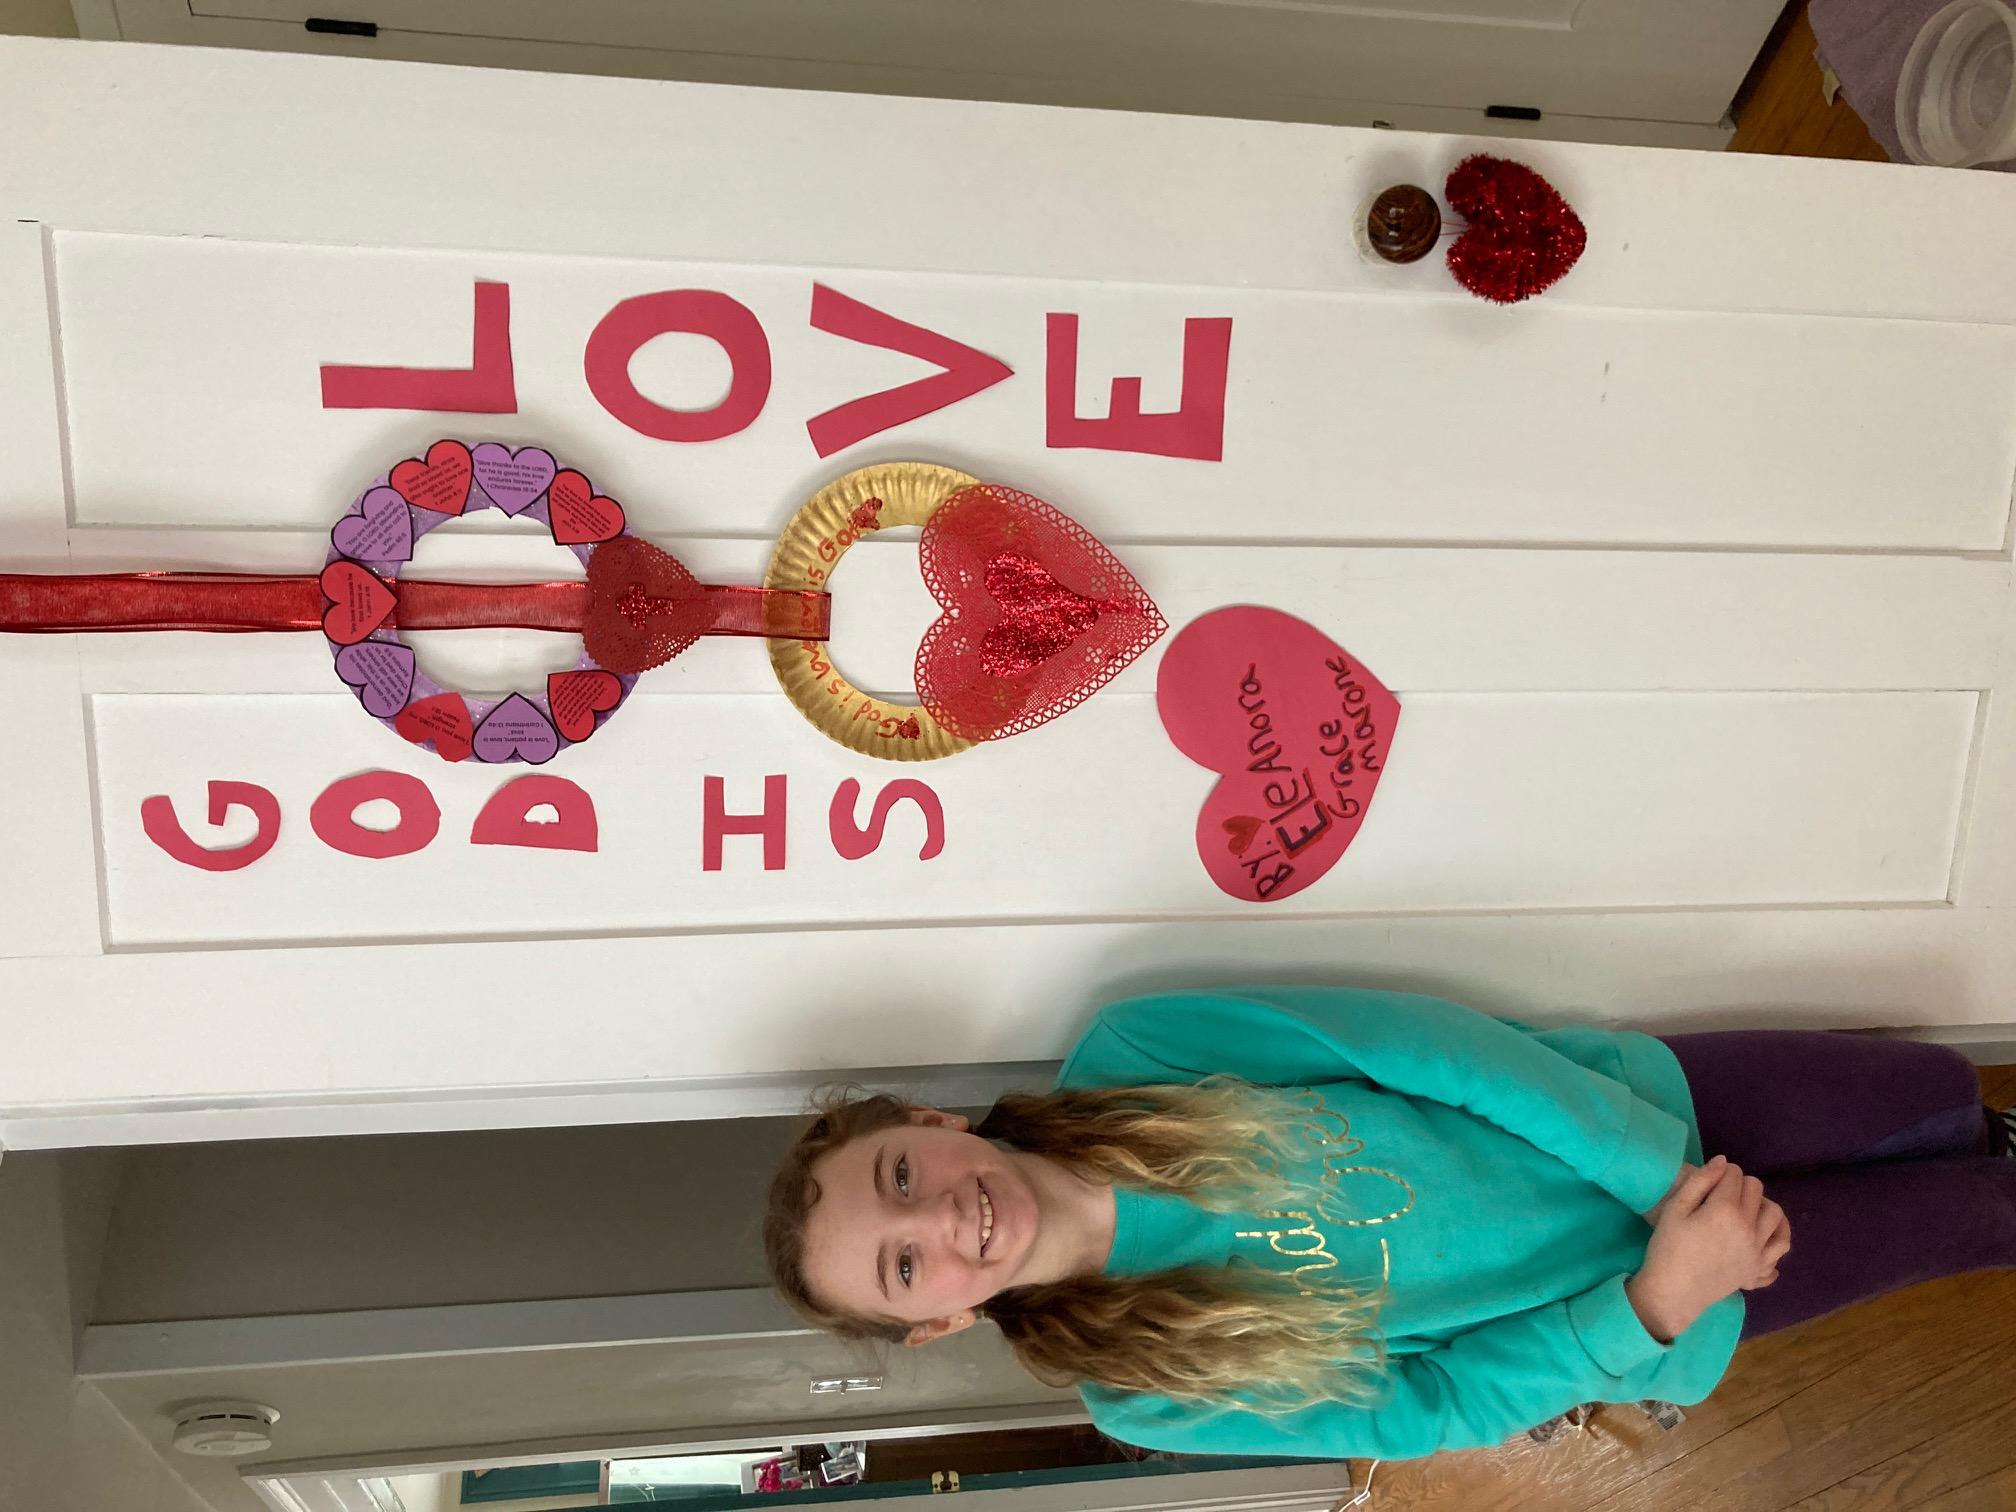 https://0201.nccdn.net/1_2/000/000/0f8/7df/jesus-loves-me-valentine-wreath2.jpg